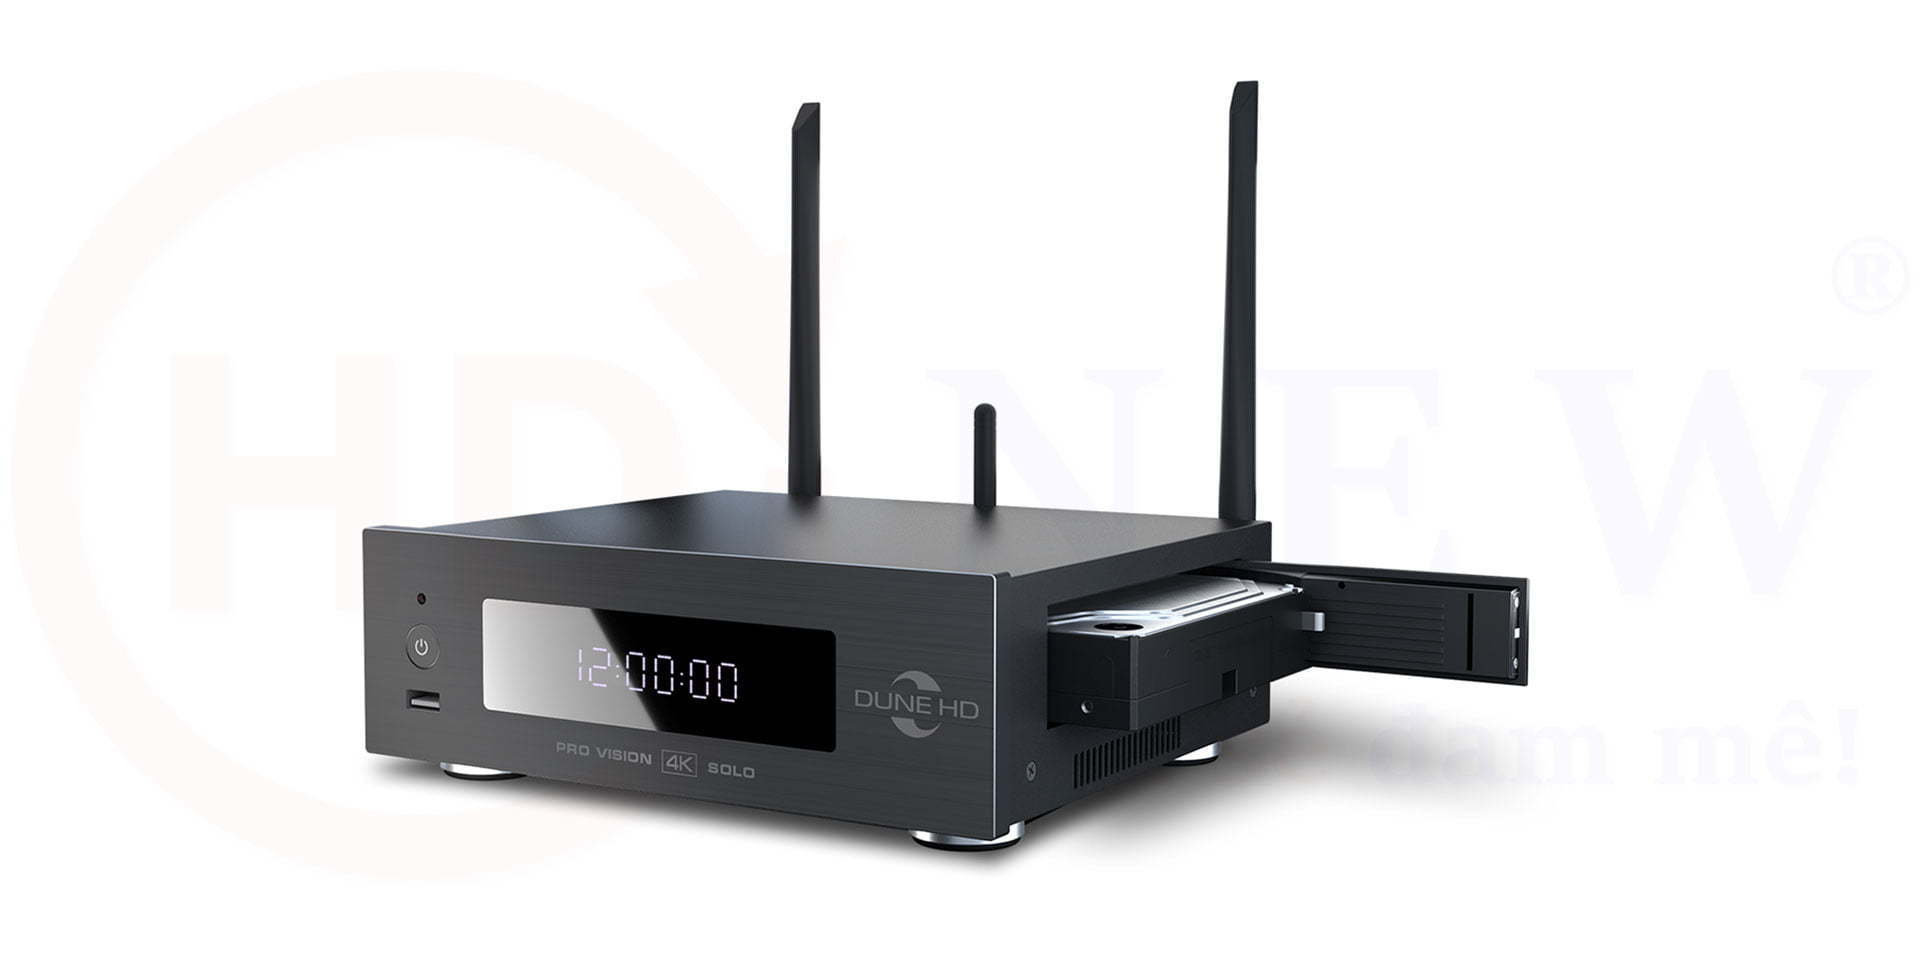 Dune HD Pro Vision 4K Solo | Đầu phát 4K Dolby Vision cao cấp | Dune HD Vietnam